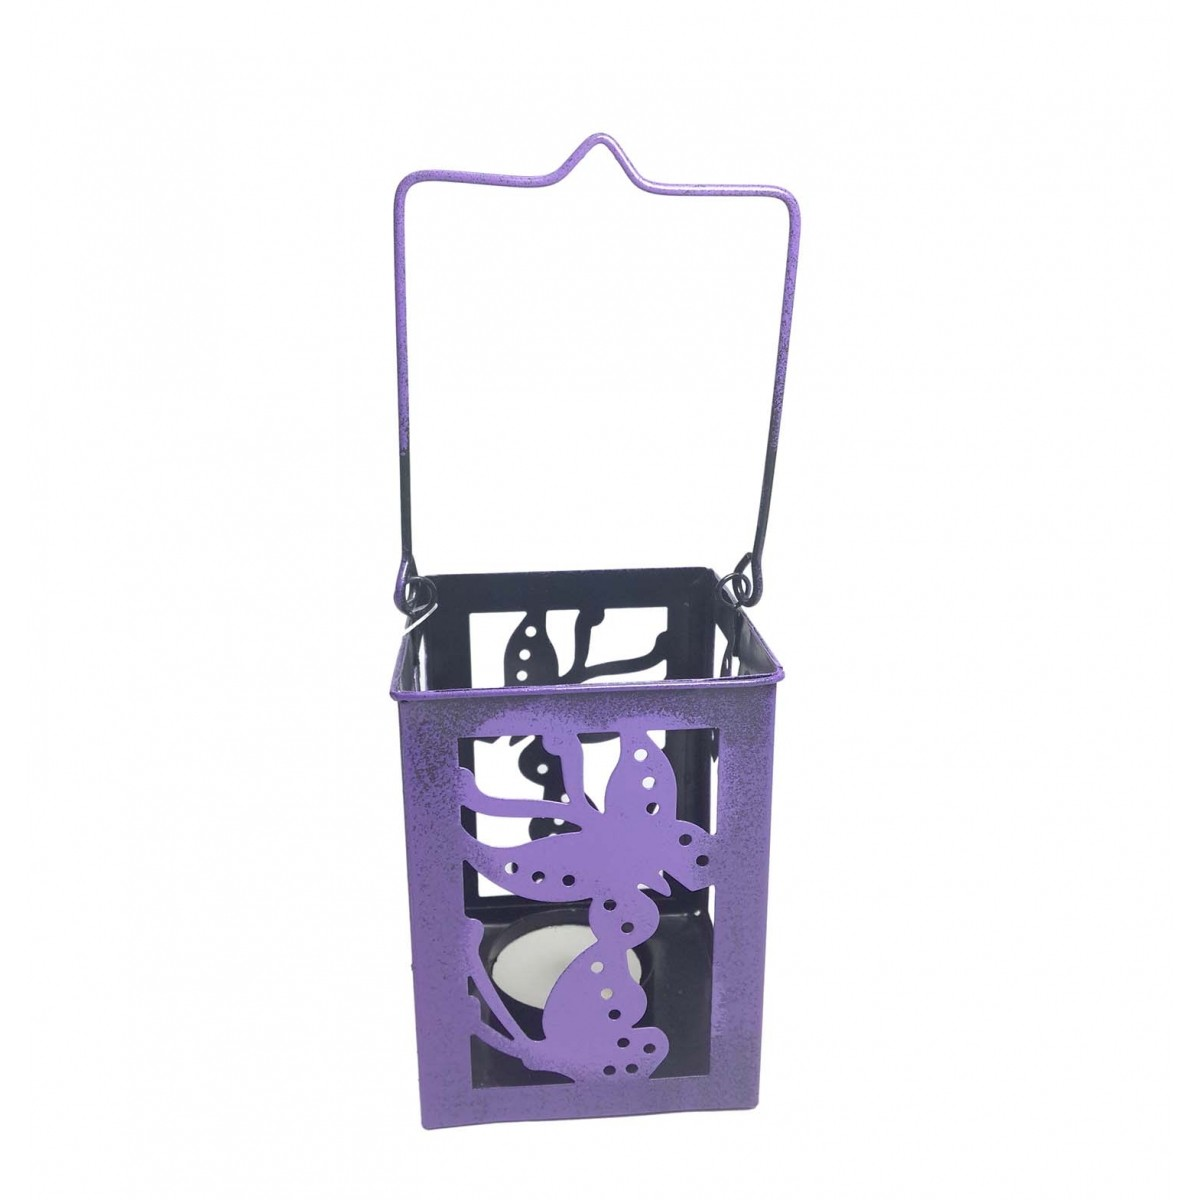 Porta Vela Decorativo Marroquina Enfeite Jardim Metal Borboleta Lilas Pequena Kit Com 2 (jard-75)